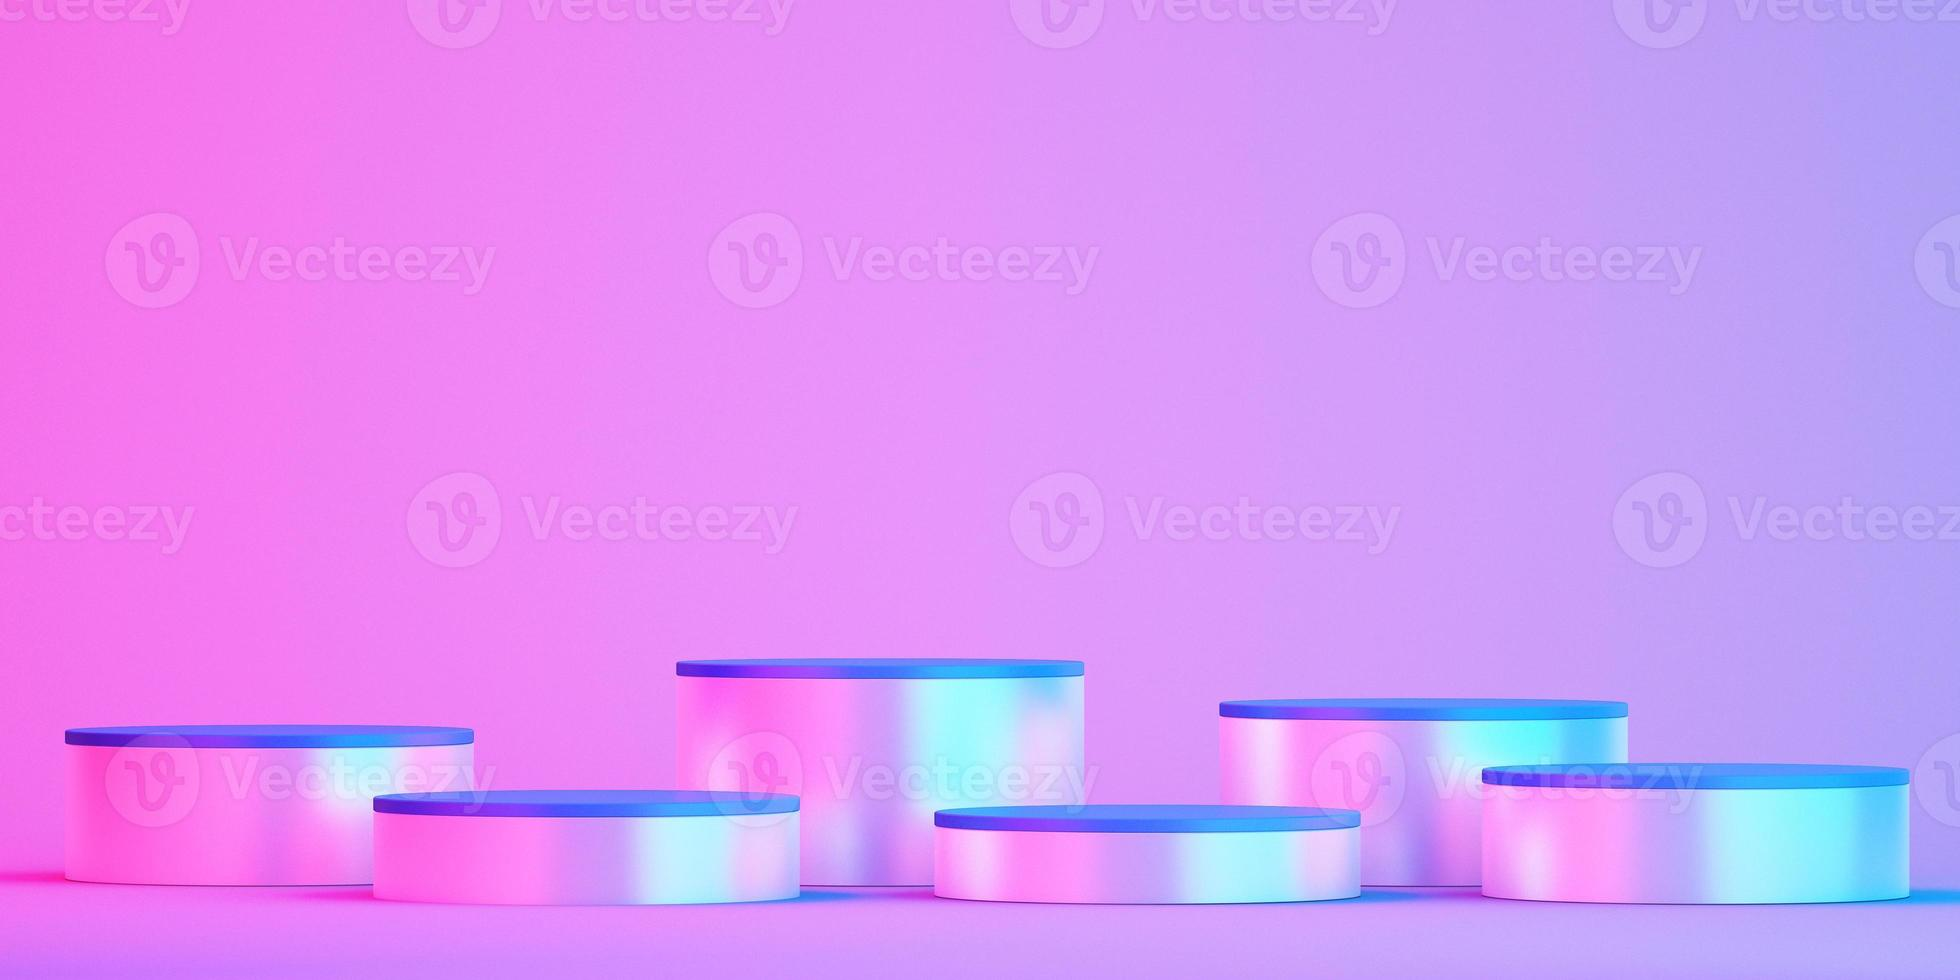 3d podium mockup for product presentation on colorful background photo